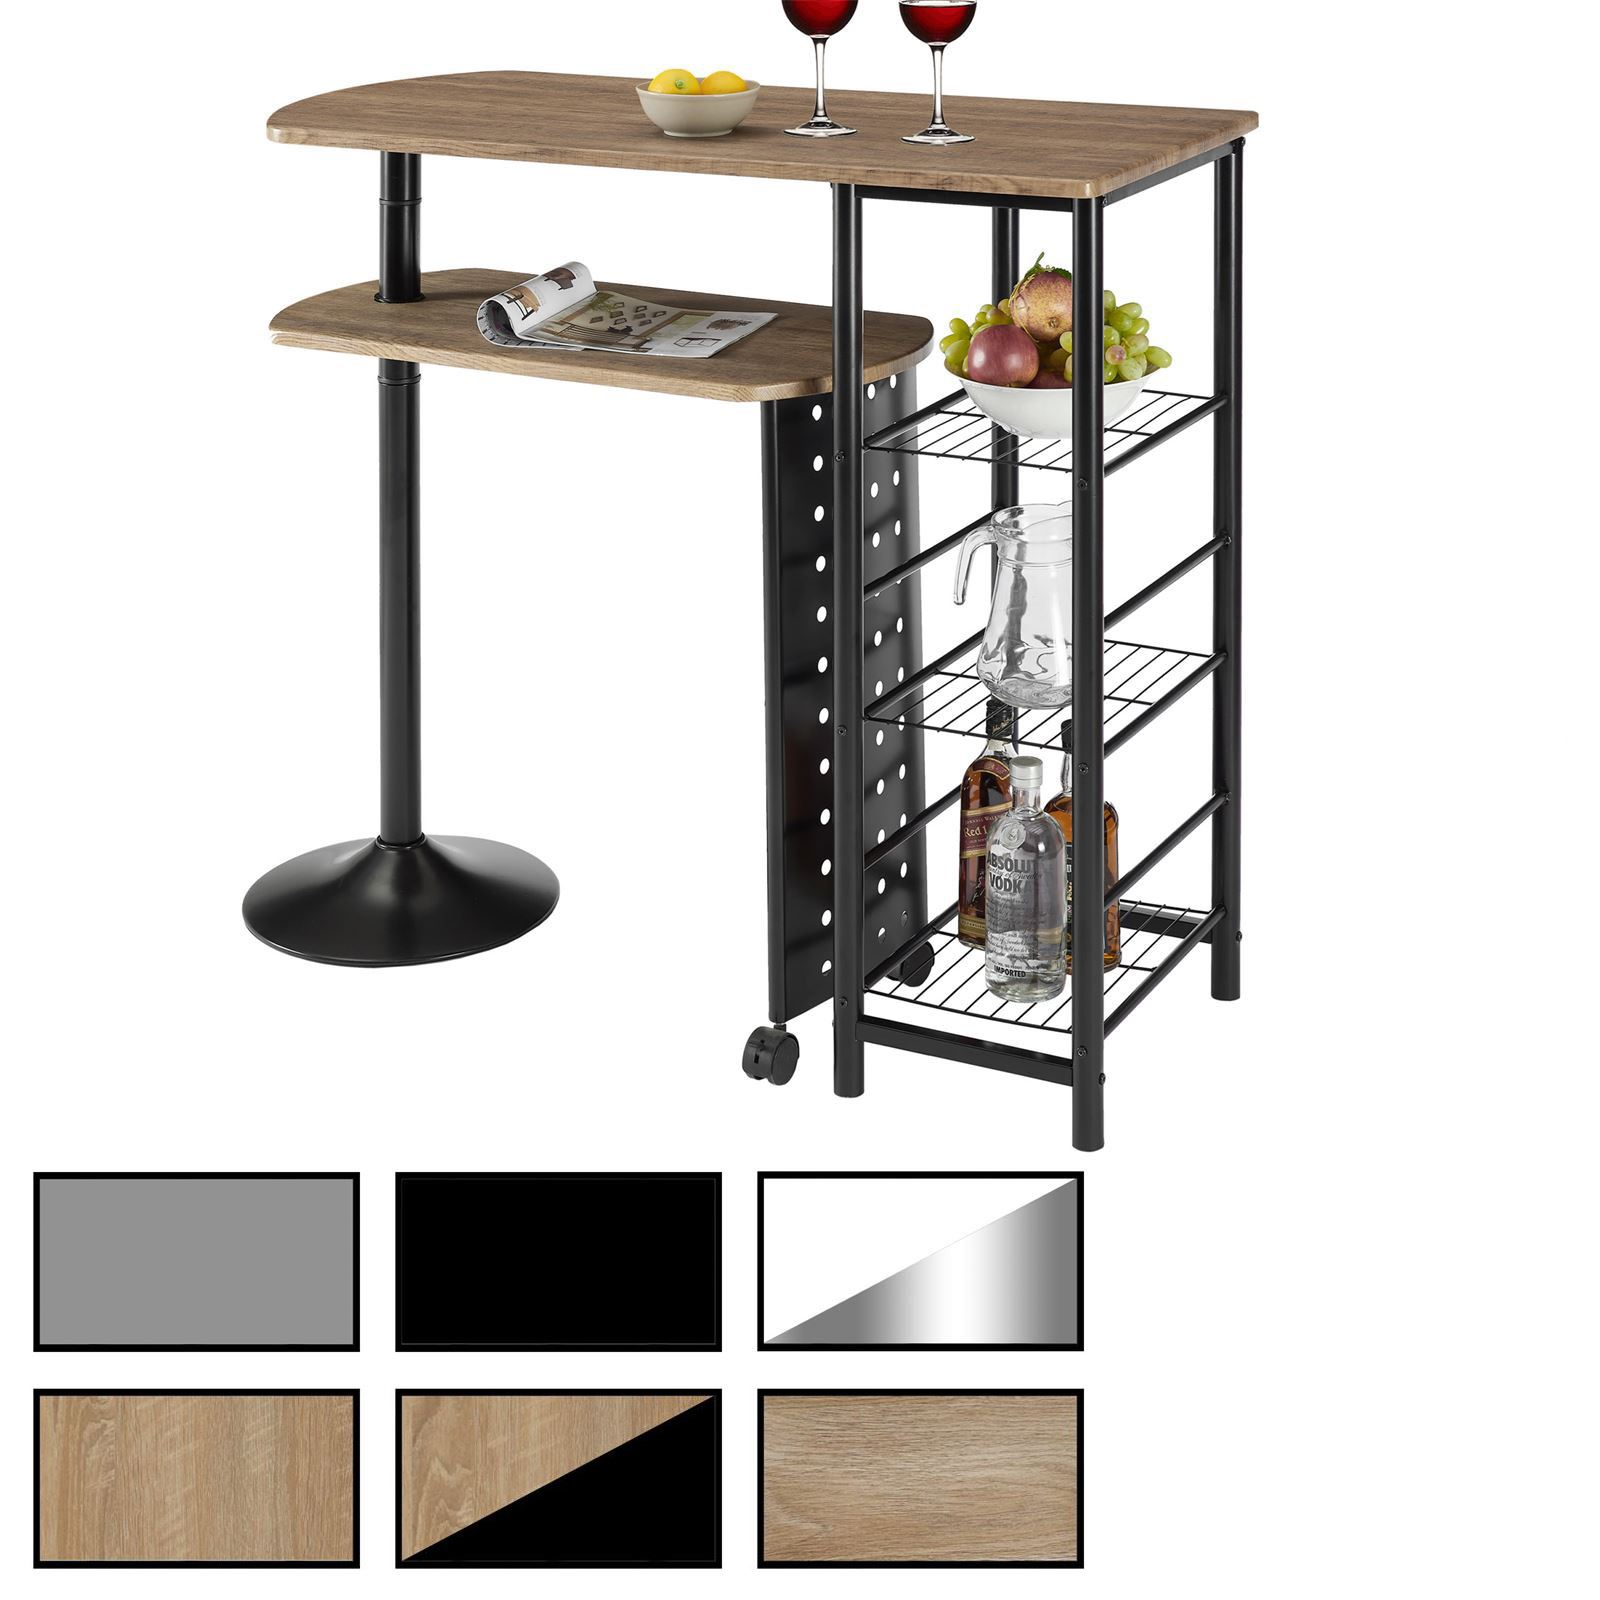 bartisch josua mit regal in 2 farben mobilia24. Black Bedroom Furniture Sets. Home Design Ideas